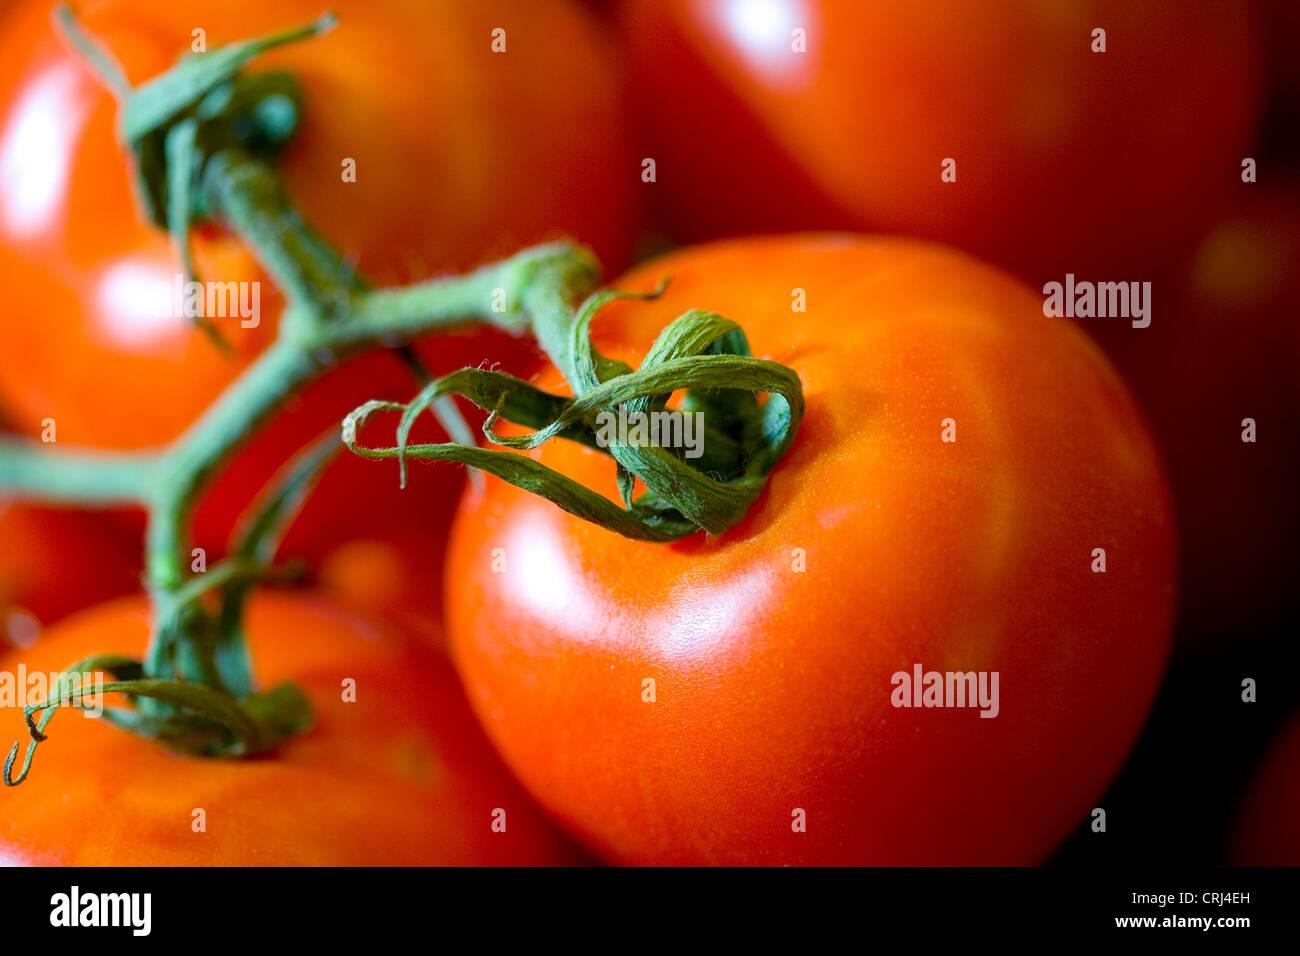 Antioxidant Cancer Cataract Food Food stuff Foodstuff Fresh Fruit Heart Disease Lycopene Lycopersicon Esculentum - Stock Image